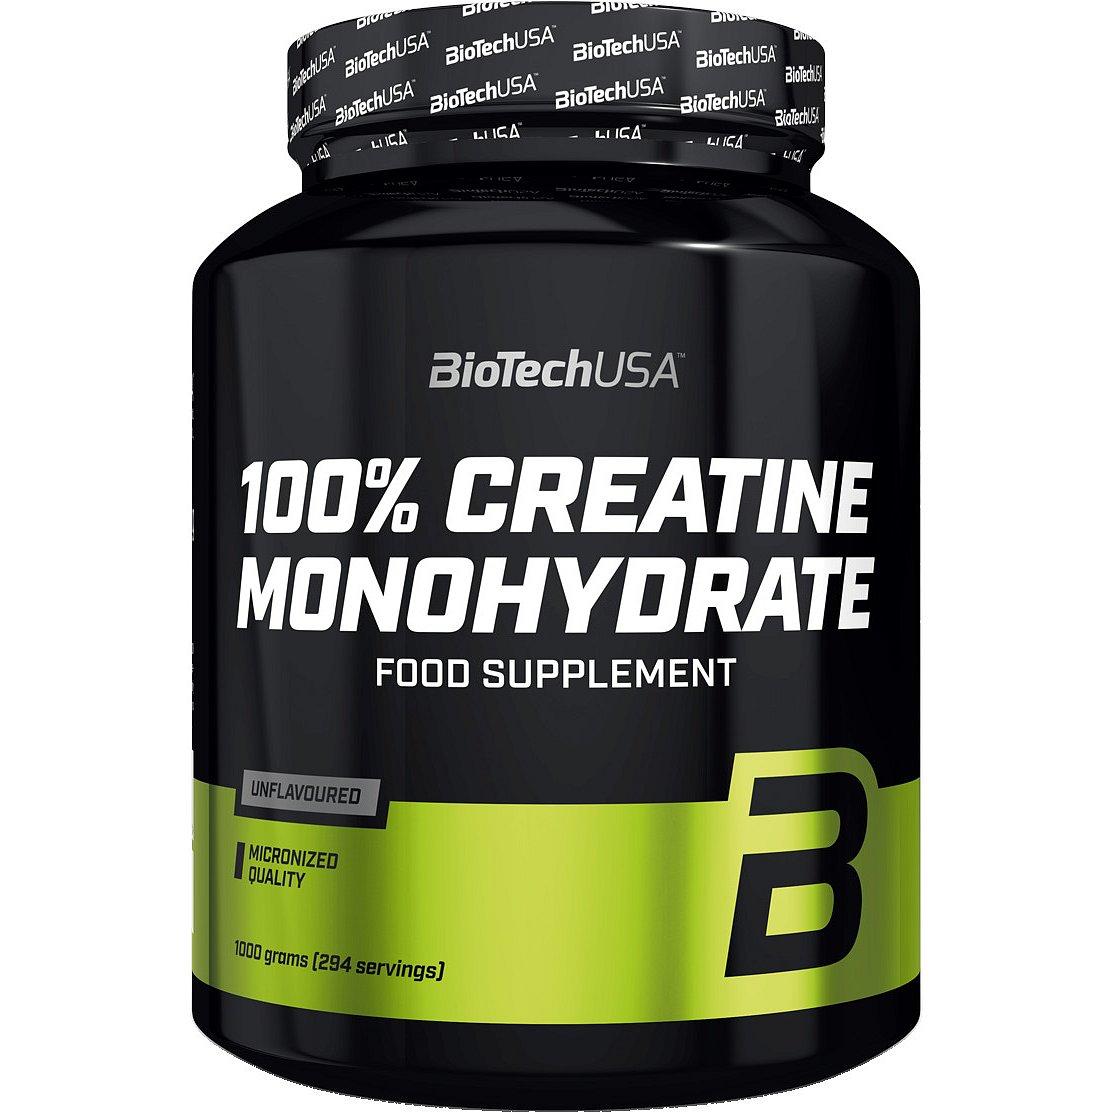 BioTech USA 100% Creatine Monohydrate 1000g